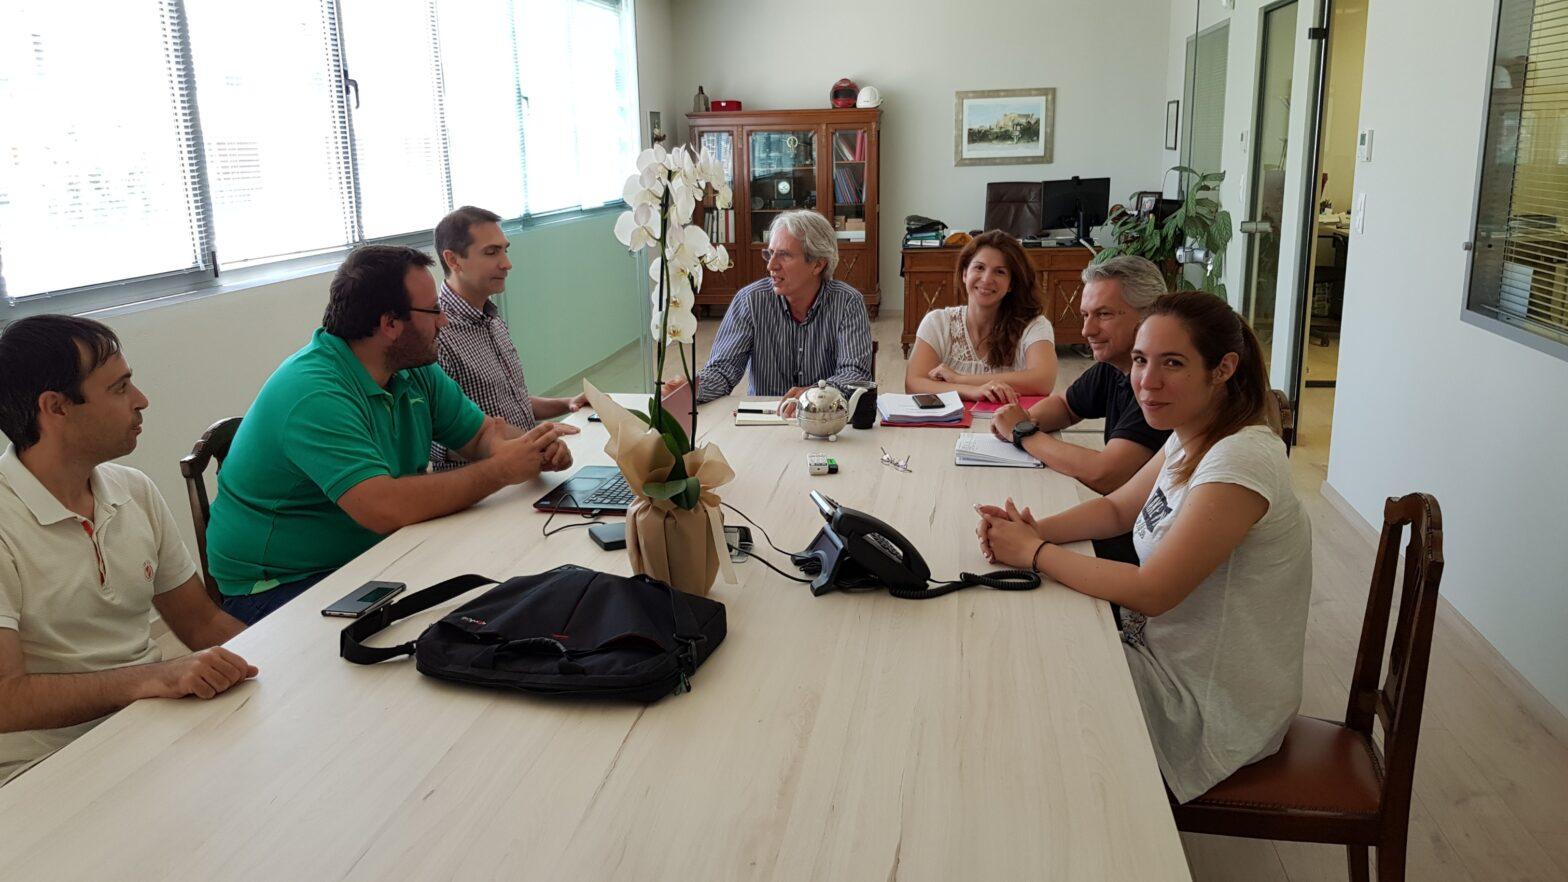 Photo from Kickoff Meeting